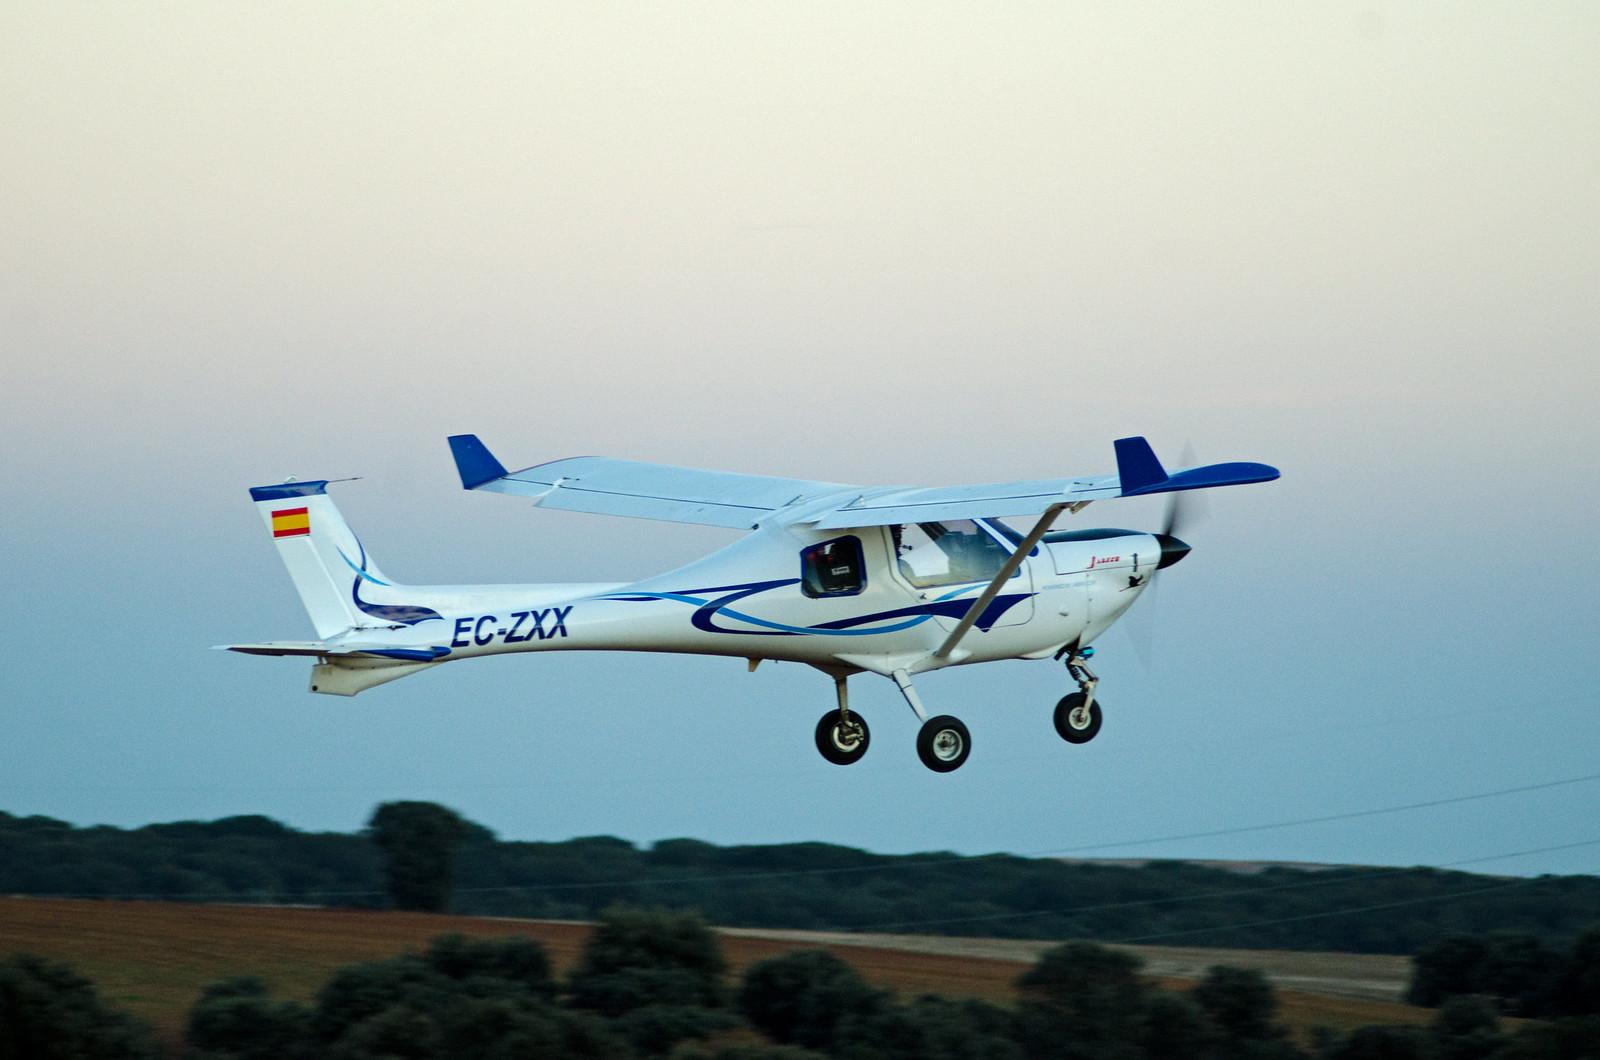 Aerodromo Astorga P92 Raul Jabiru Roberto Jonathan (33)